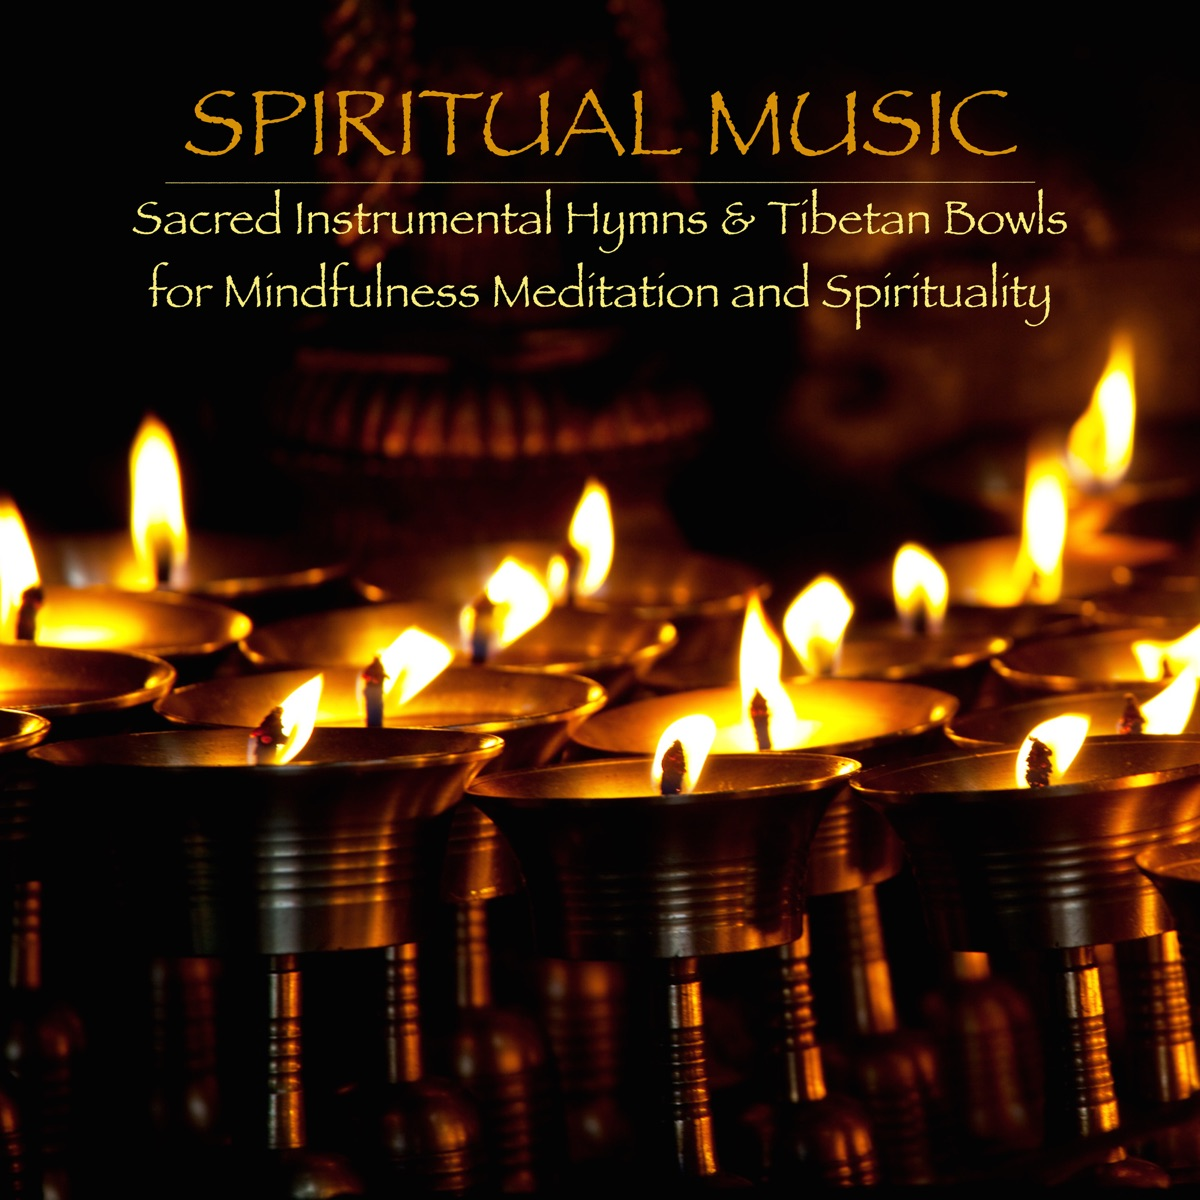 Spiritual Music, Sacred Instrumental Hymns & Tibetan Bowls for